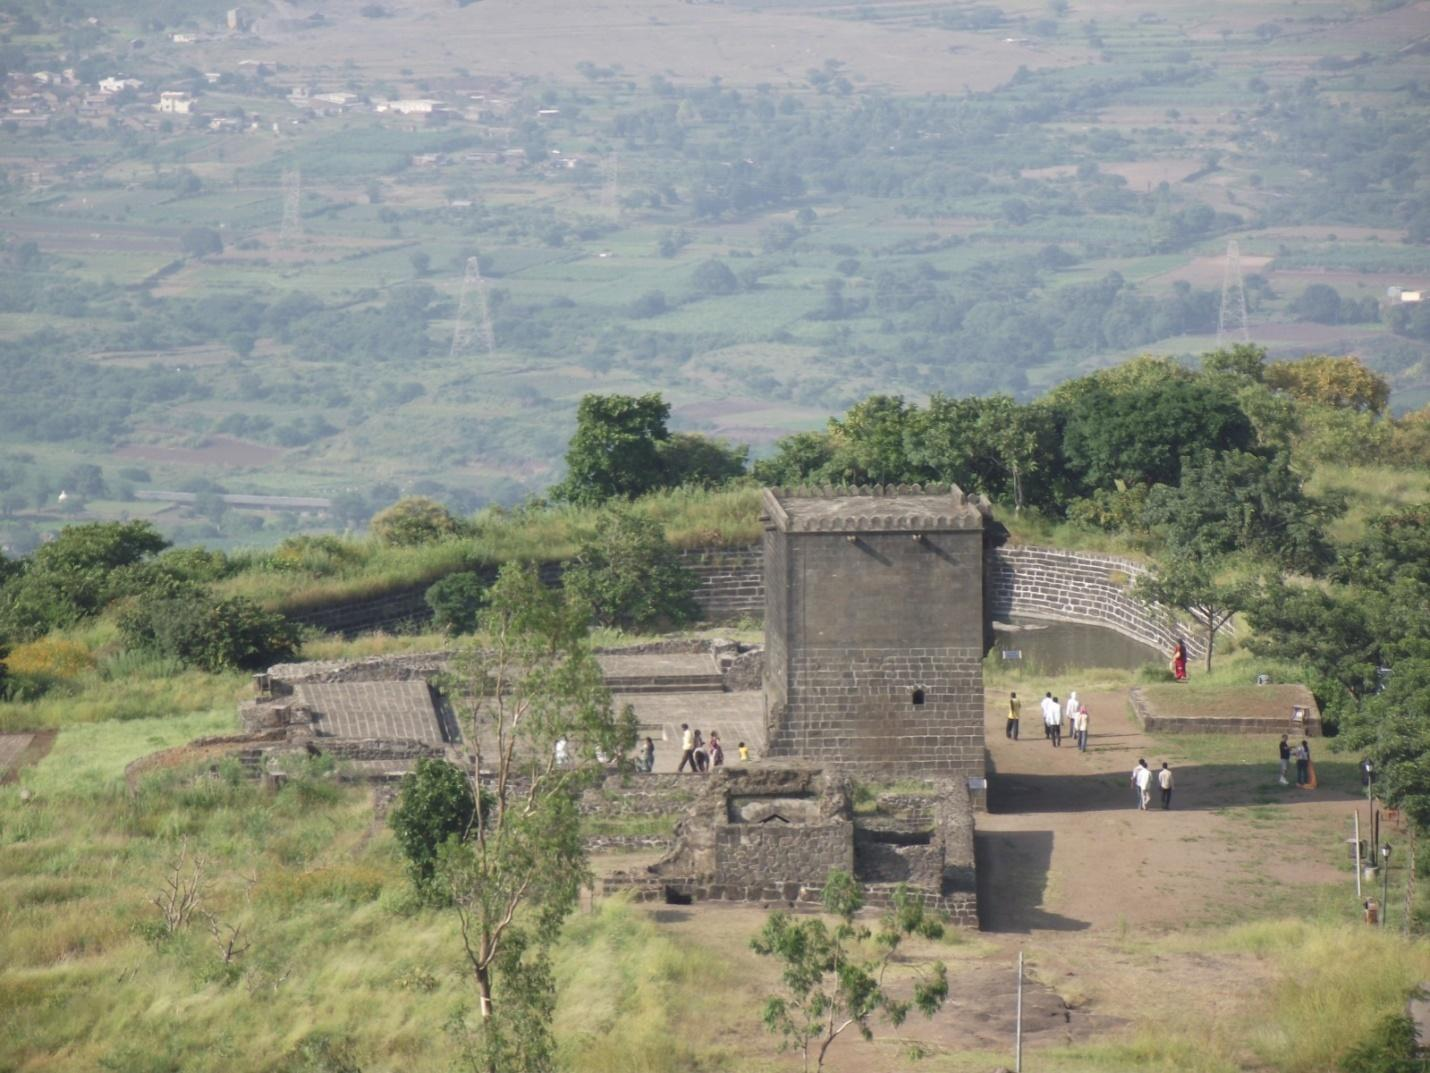 Shivneri Fort, near Pune, Maharashtra by Wikipedia